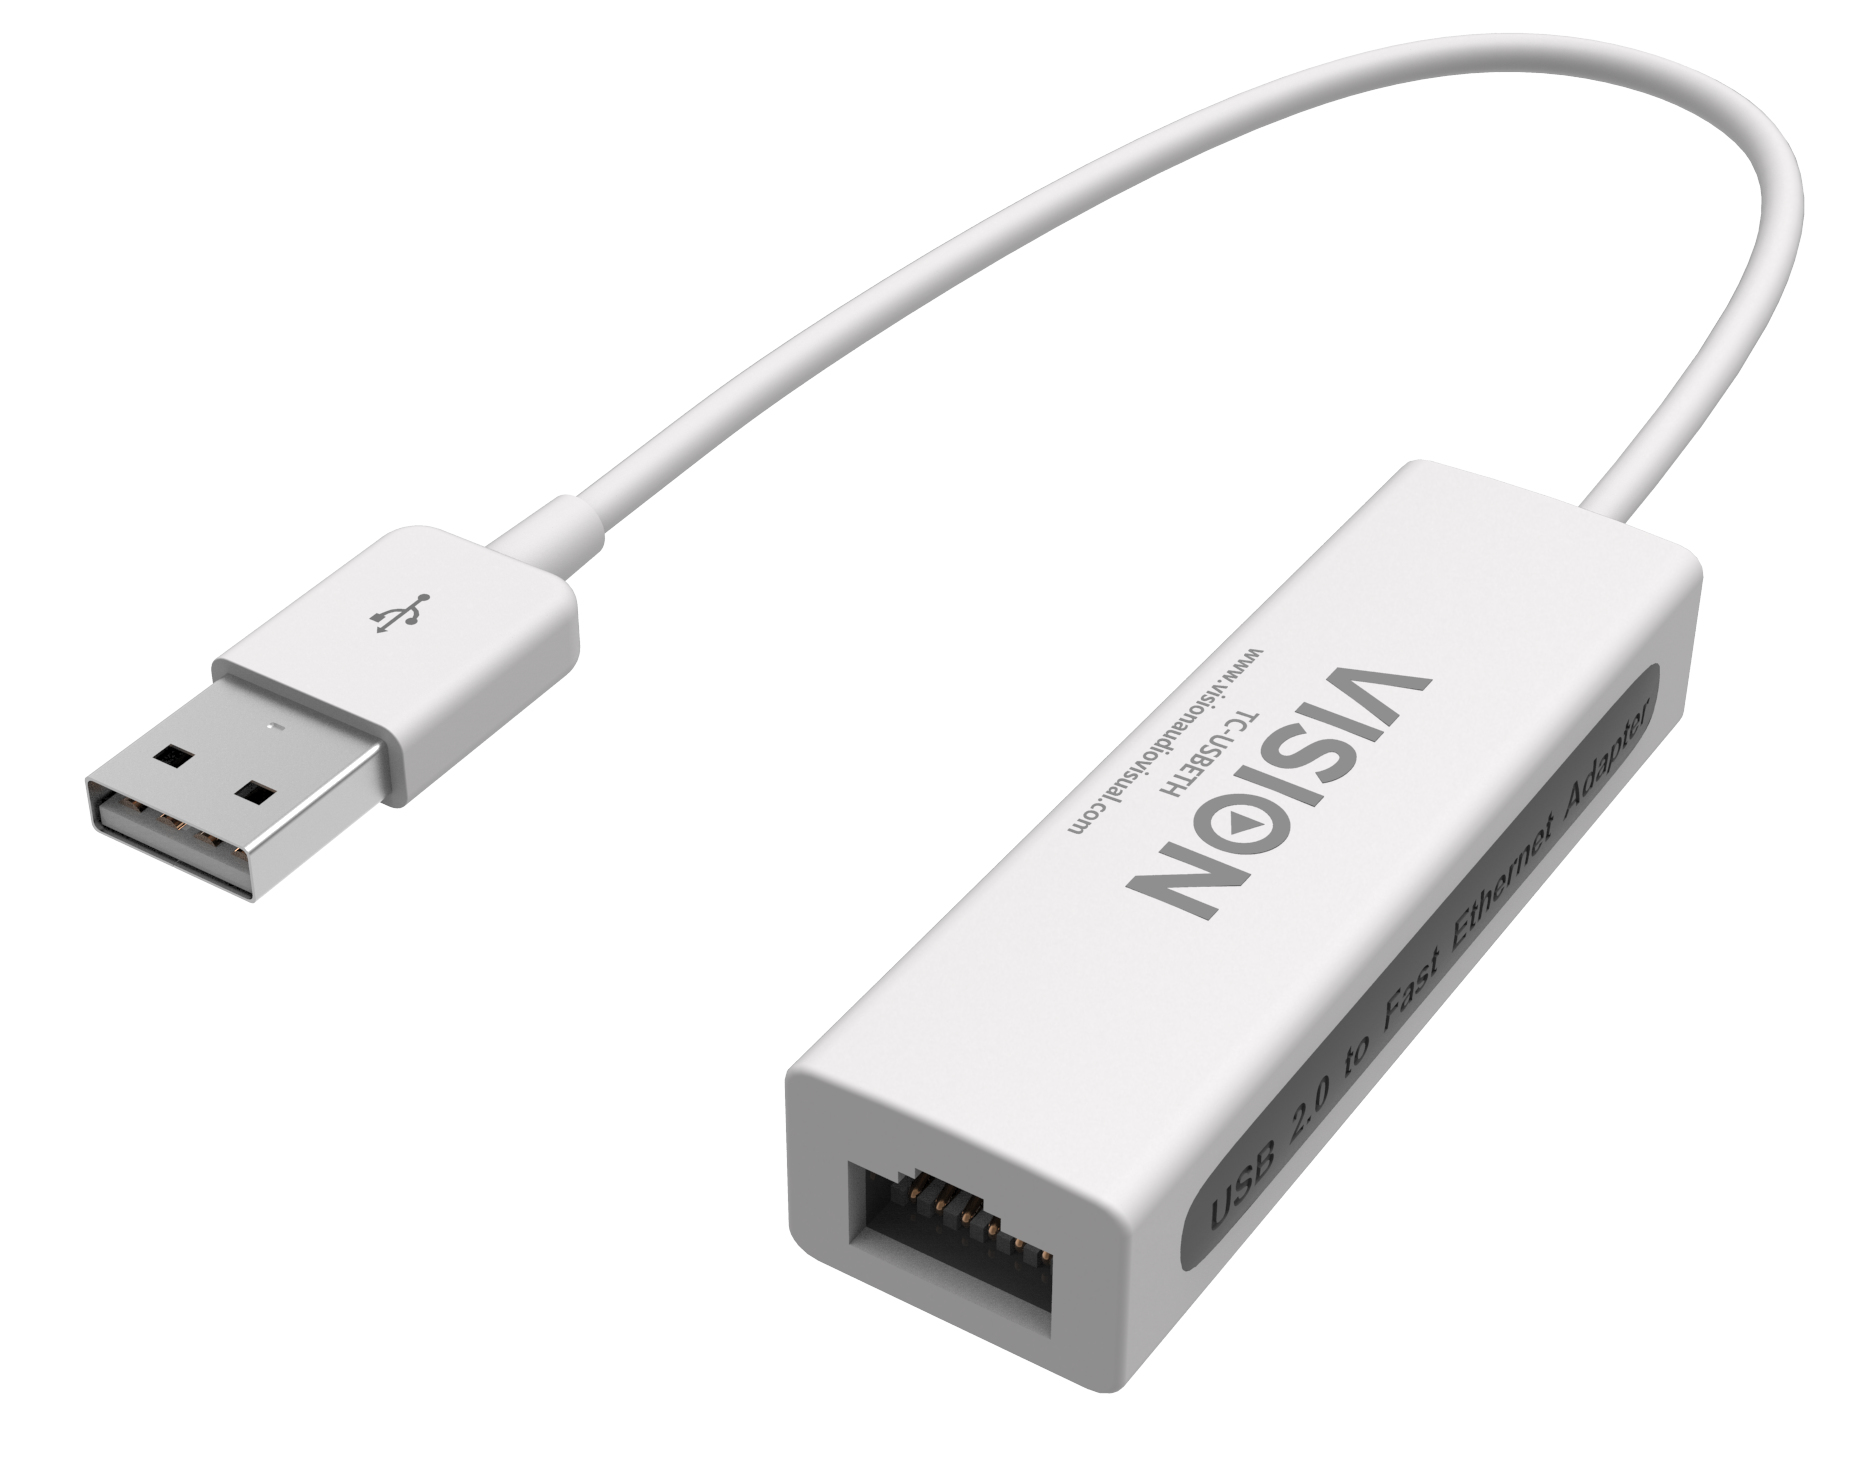 Vision TC-USBETH adaptador de cable USB-B RJ-45 Blanco